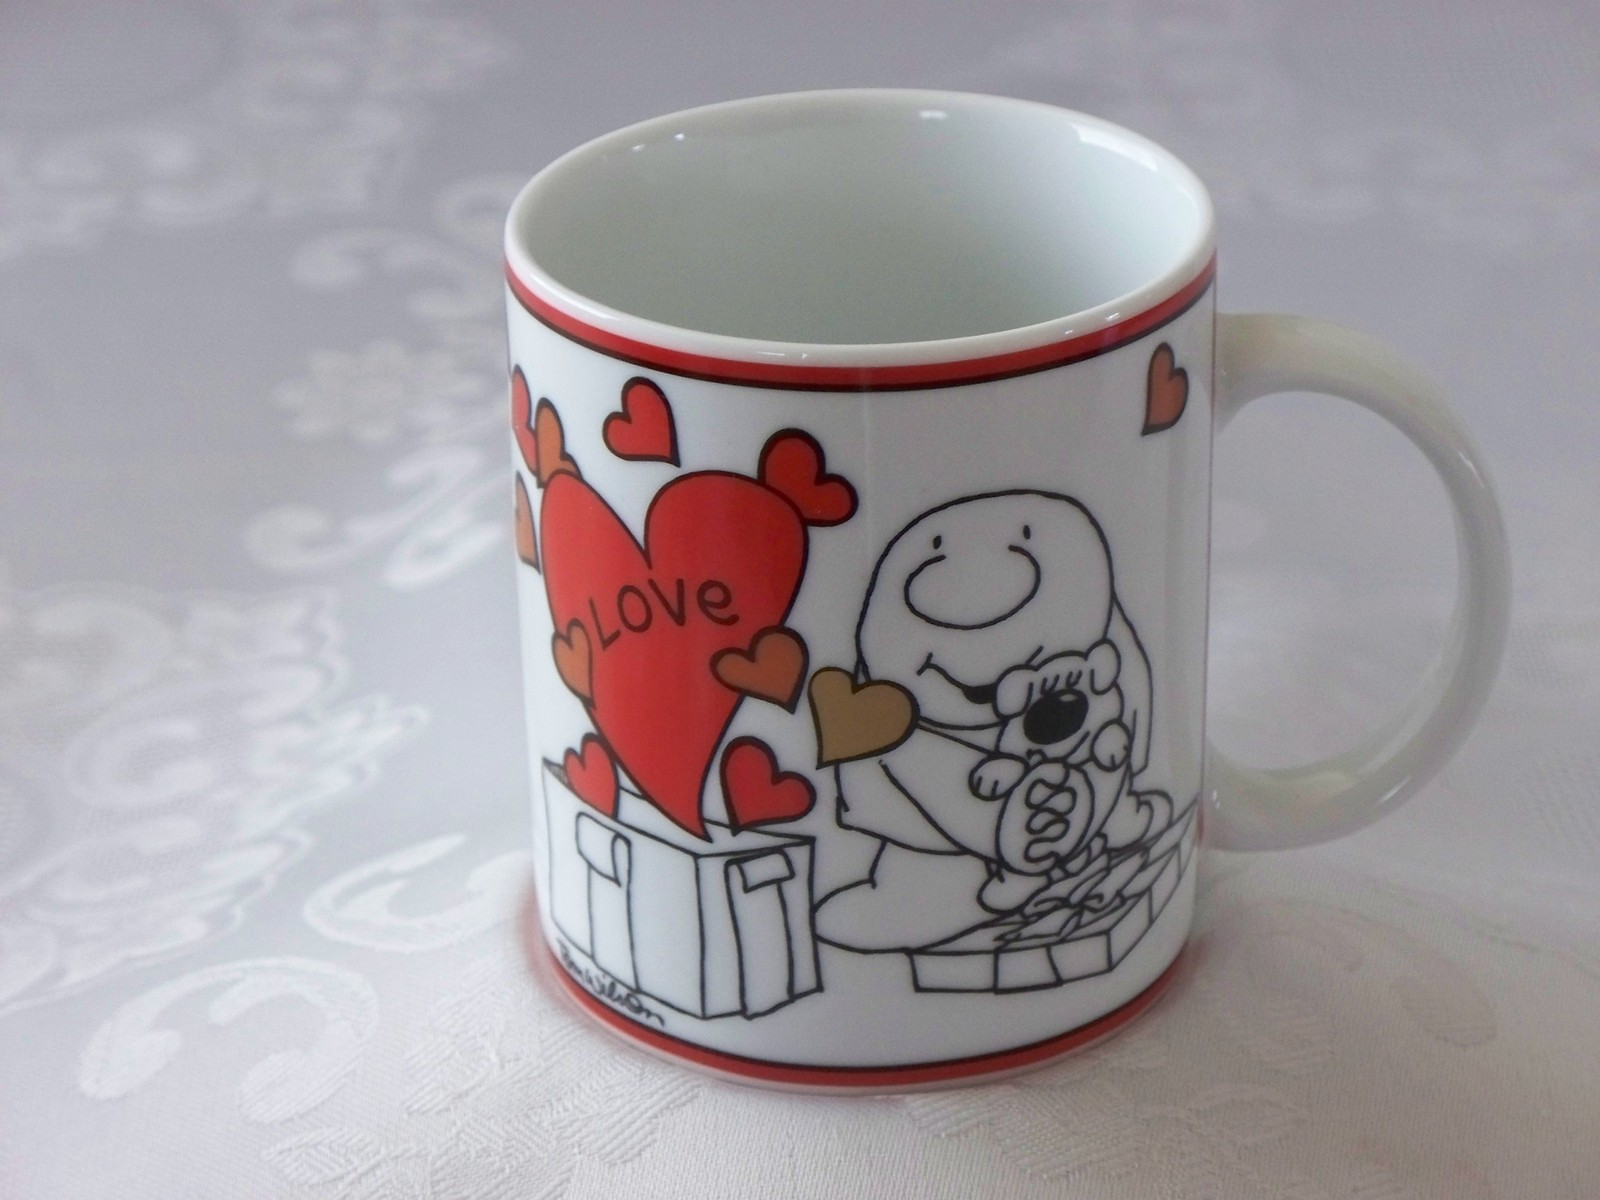 Ziggy Love Is A Present 12 Oz Coffee Mug VGC